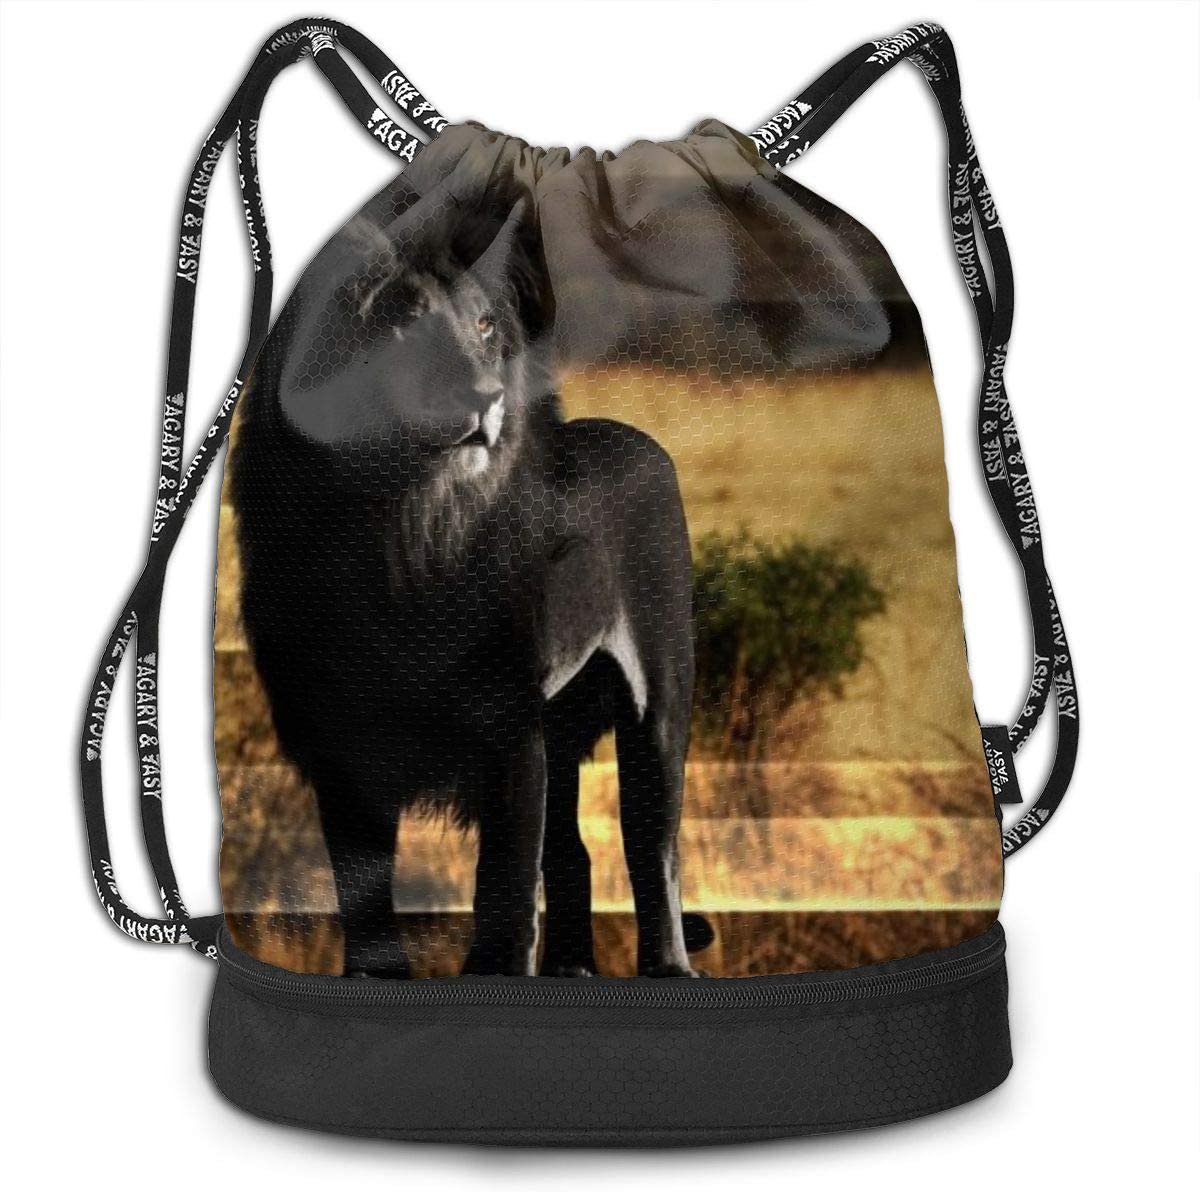 African White Lion Drawstring Small Bag Waterproof For Women Men Girl Cut Backpack Zipper Cinch Sack